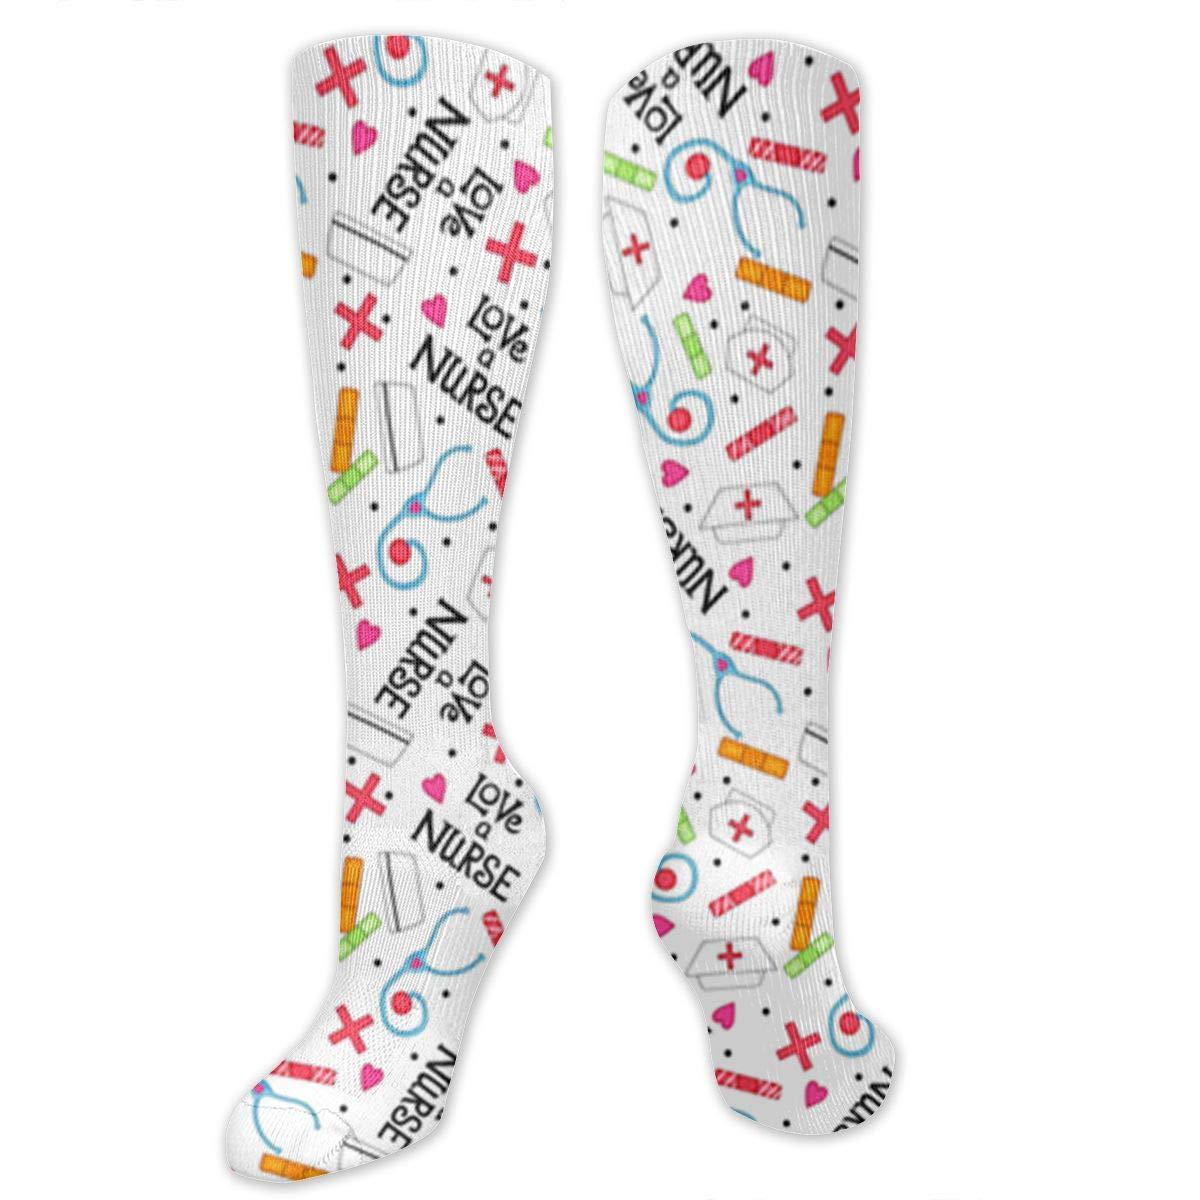 Willbegood99 Nurse Whimsy Mens Fun Dress Socks Colorful Pattened Novelty Mid-Calf Crew Socks Premium Cotton Vibrant Art Socks